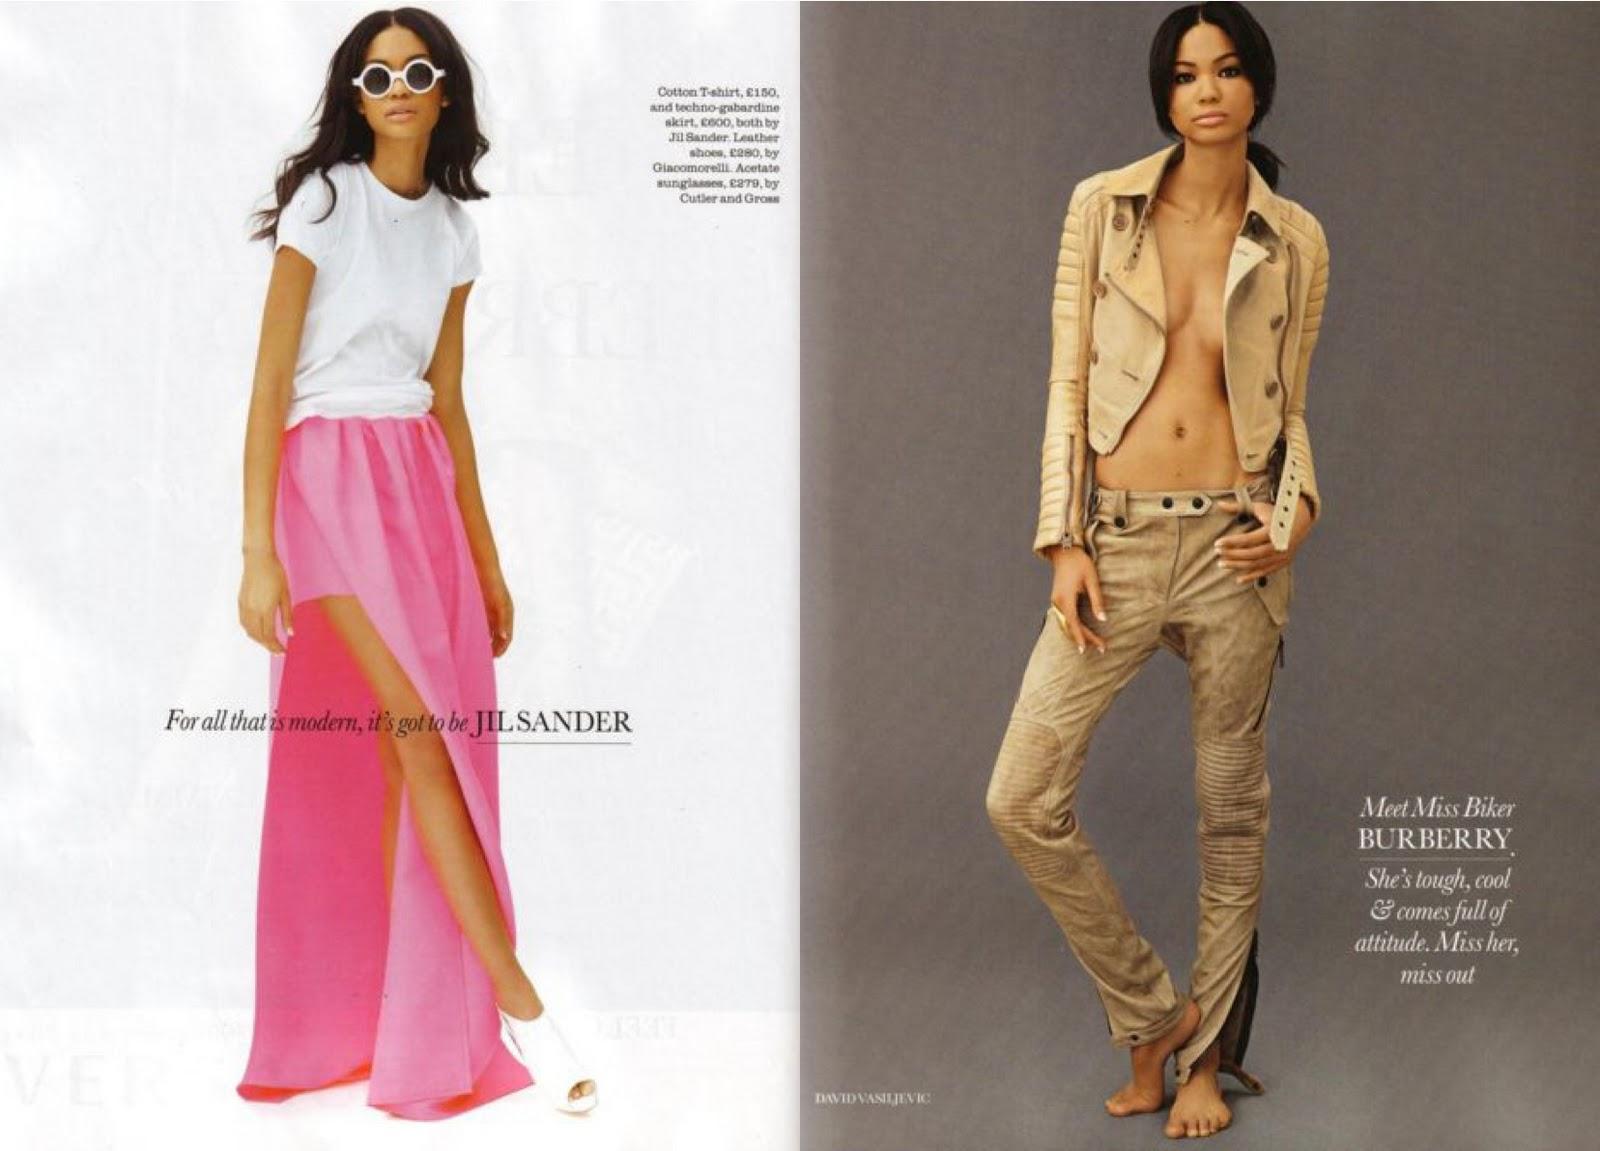 http://2.bp.blogspot.com/_PfmV3qvy8FY/TSvJF5vhdrI/AAAAAAAAA5g/LxBBjlOCVC8/s1600/la+modella+mafia+Chanel+Iman+Elle+UK+February+2011+by+David+Vasiljevic+2.jpg